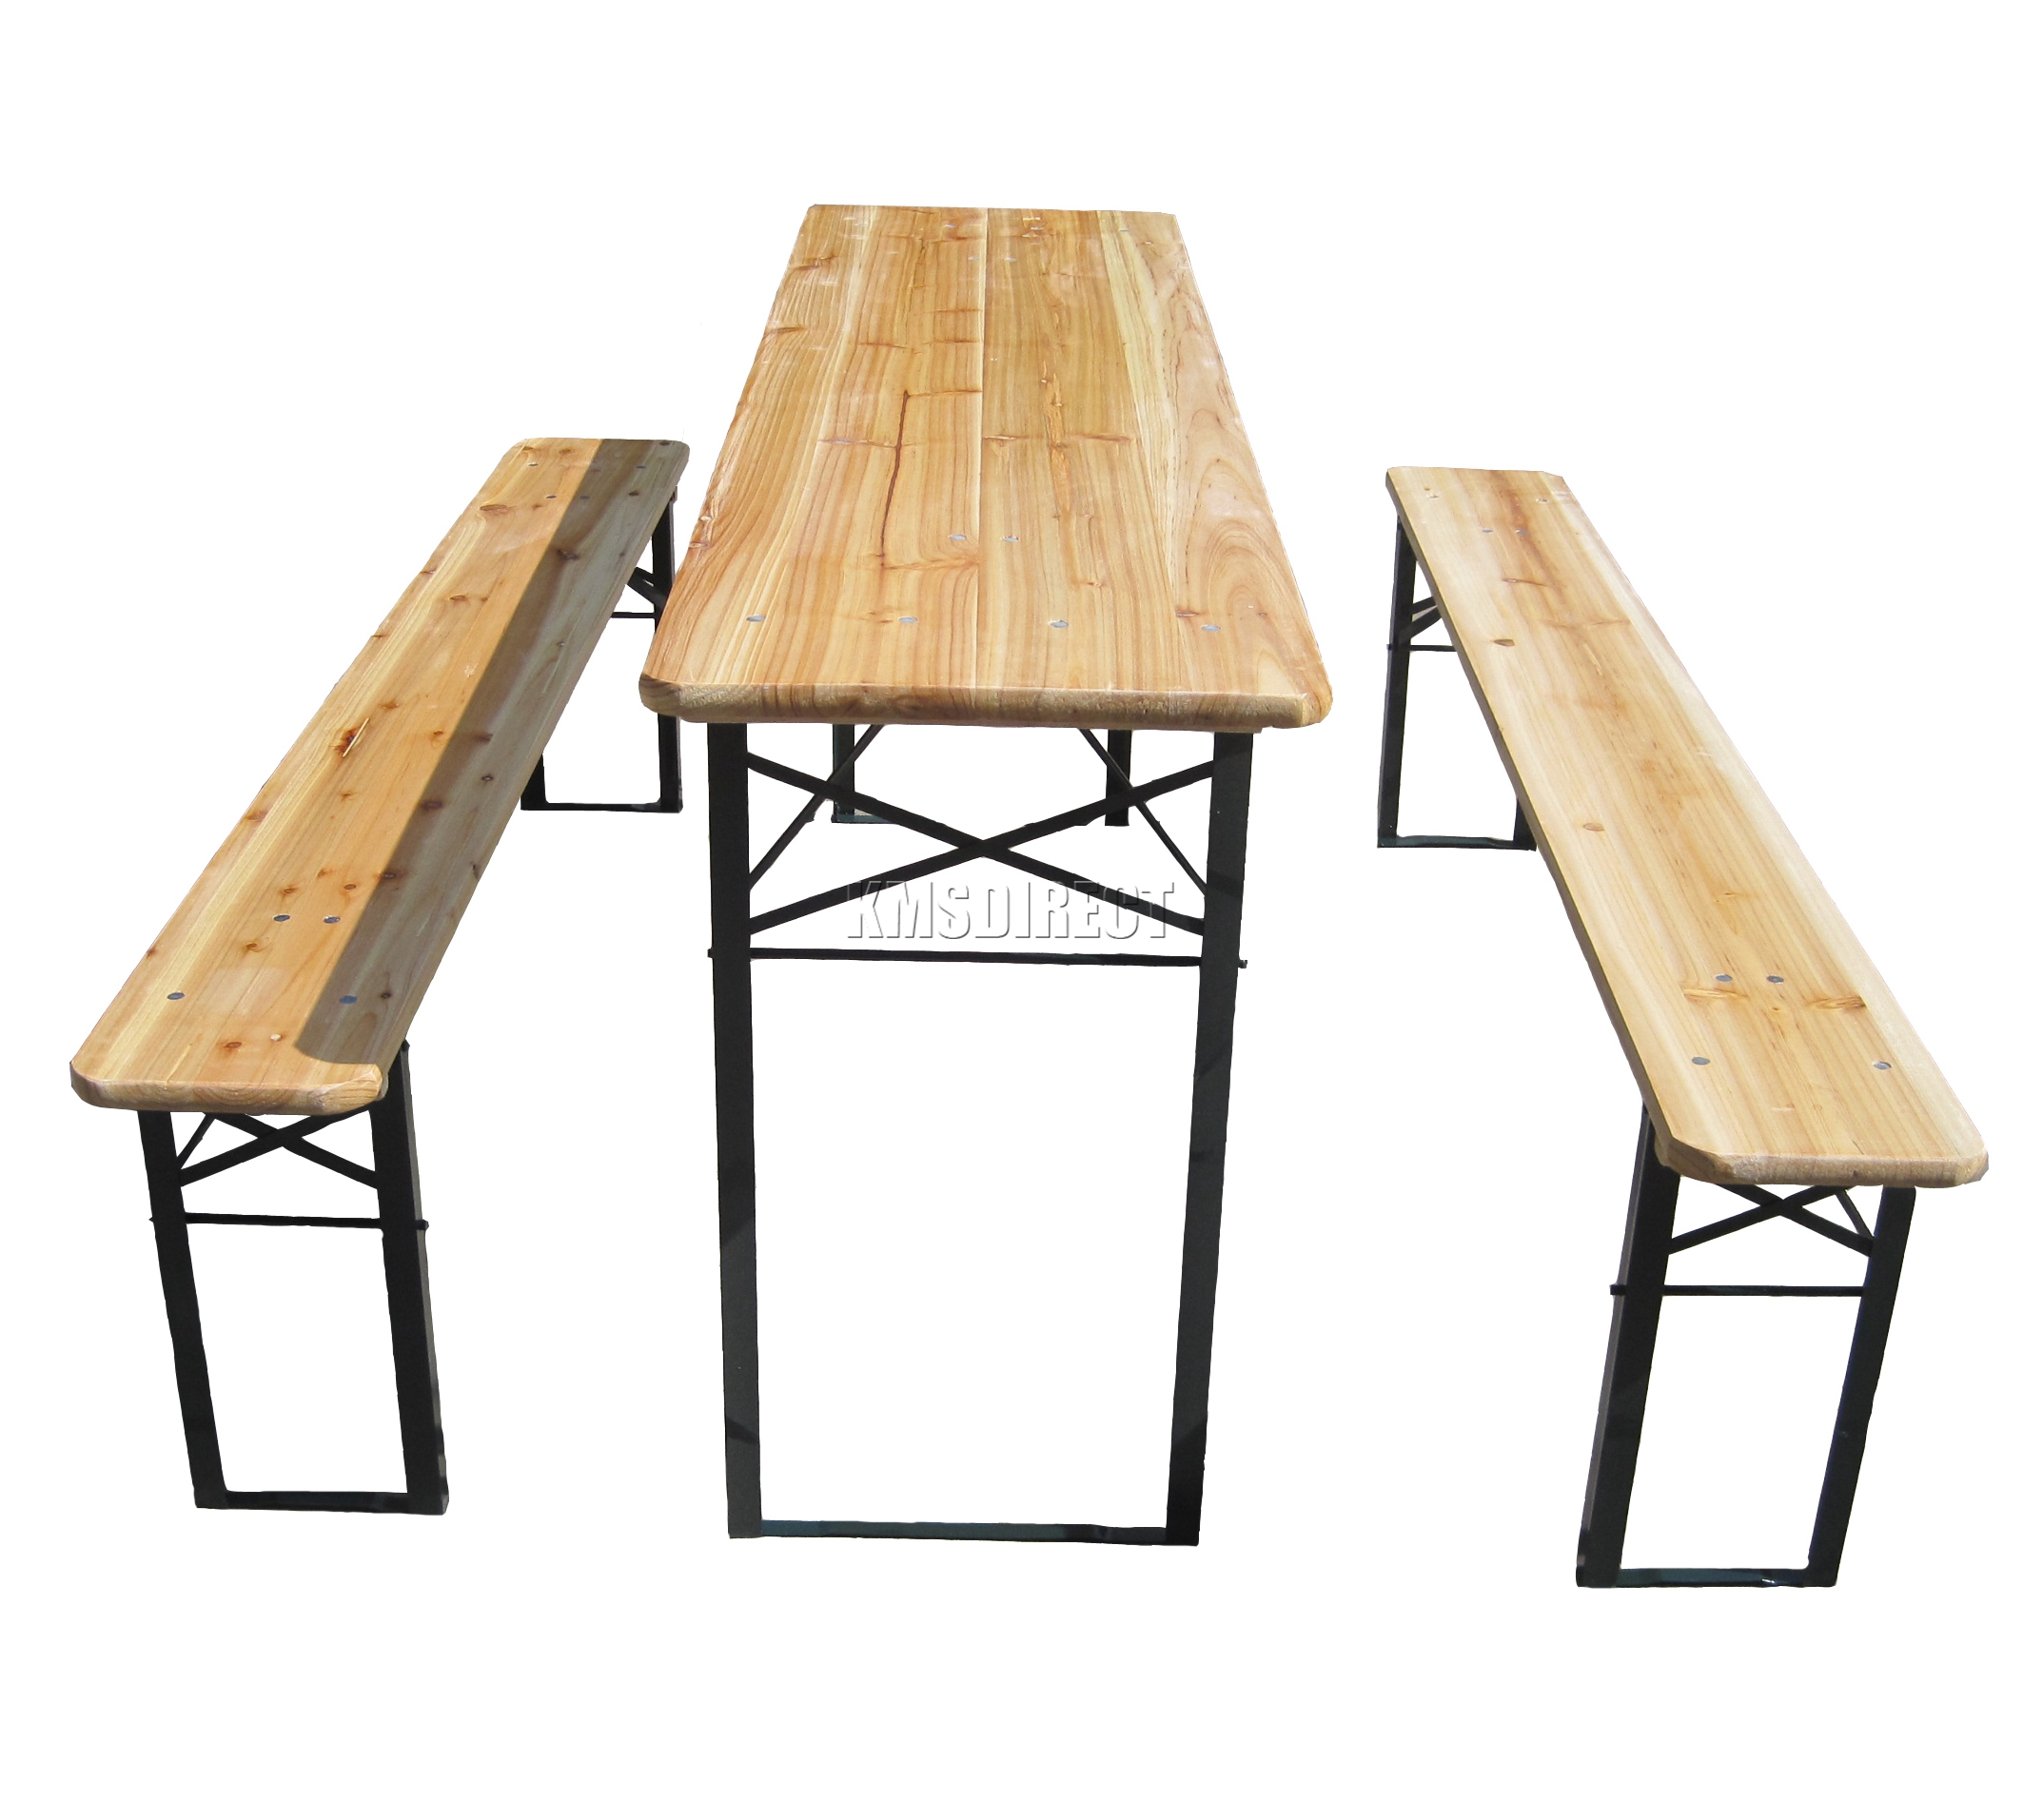 Outdoor Wooden Folding Beer Table Bench Set Trestle Garden